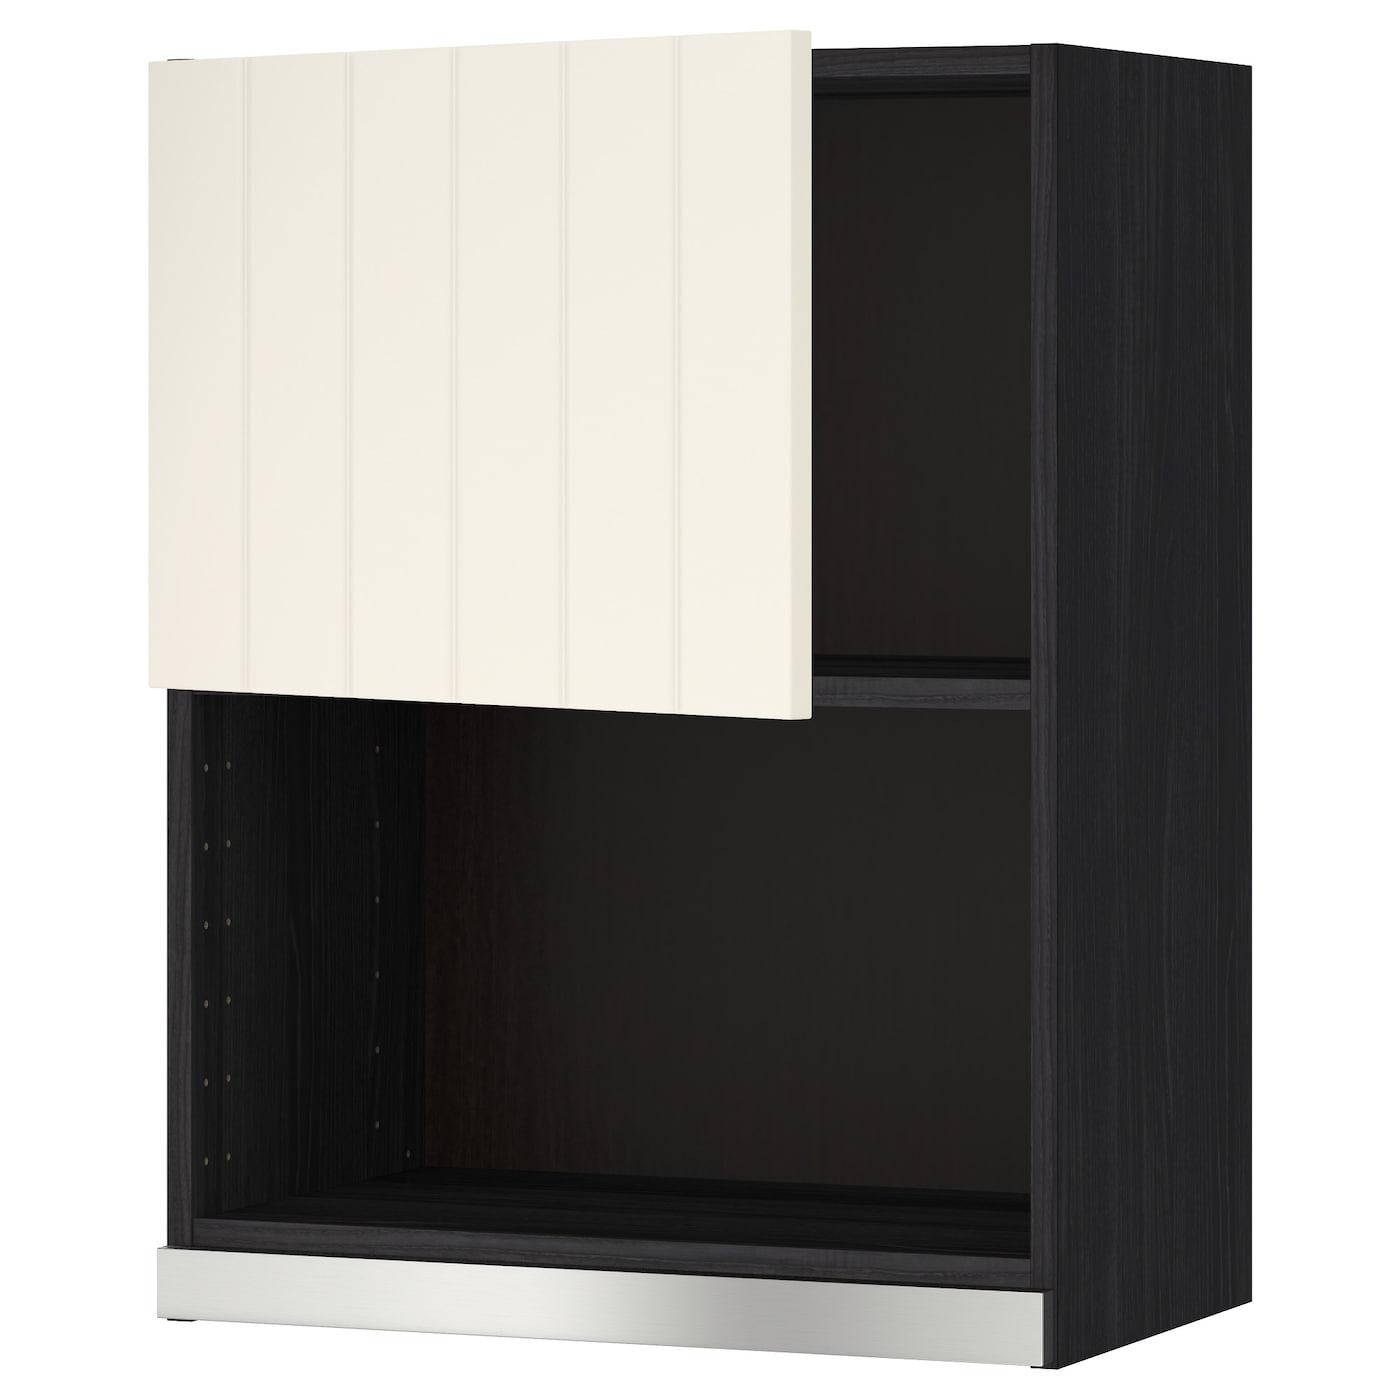 Oven Housing Units Ikea